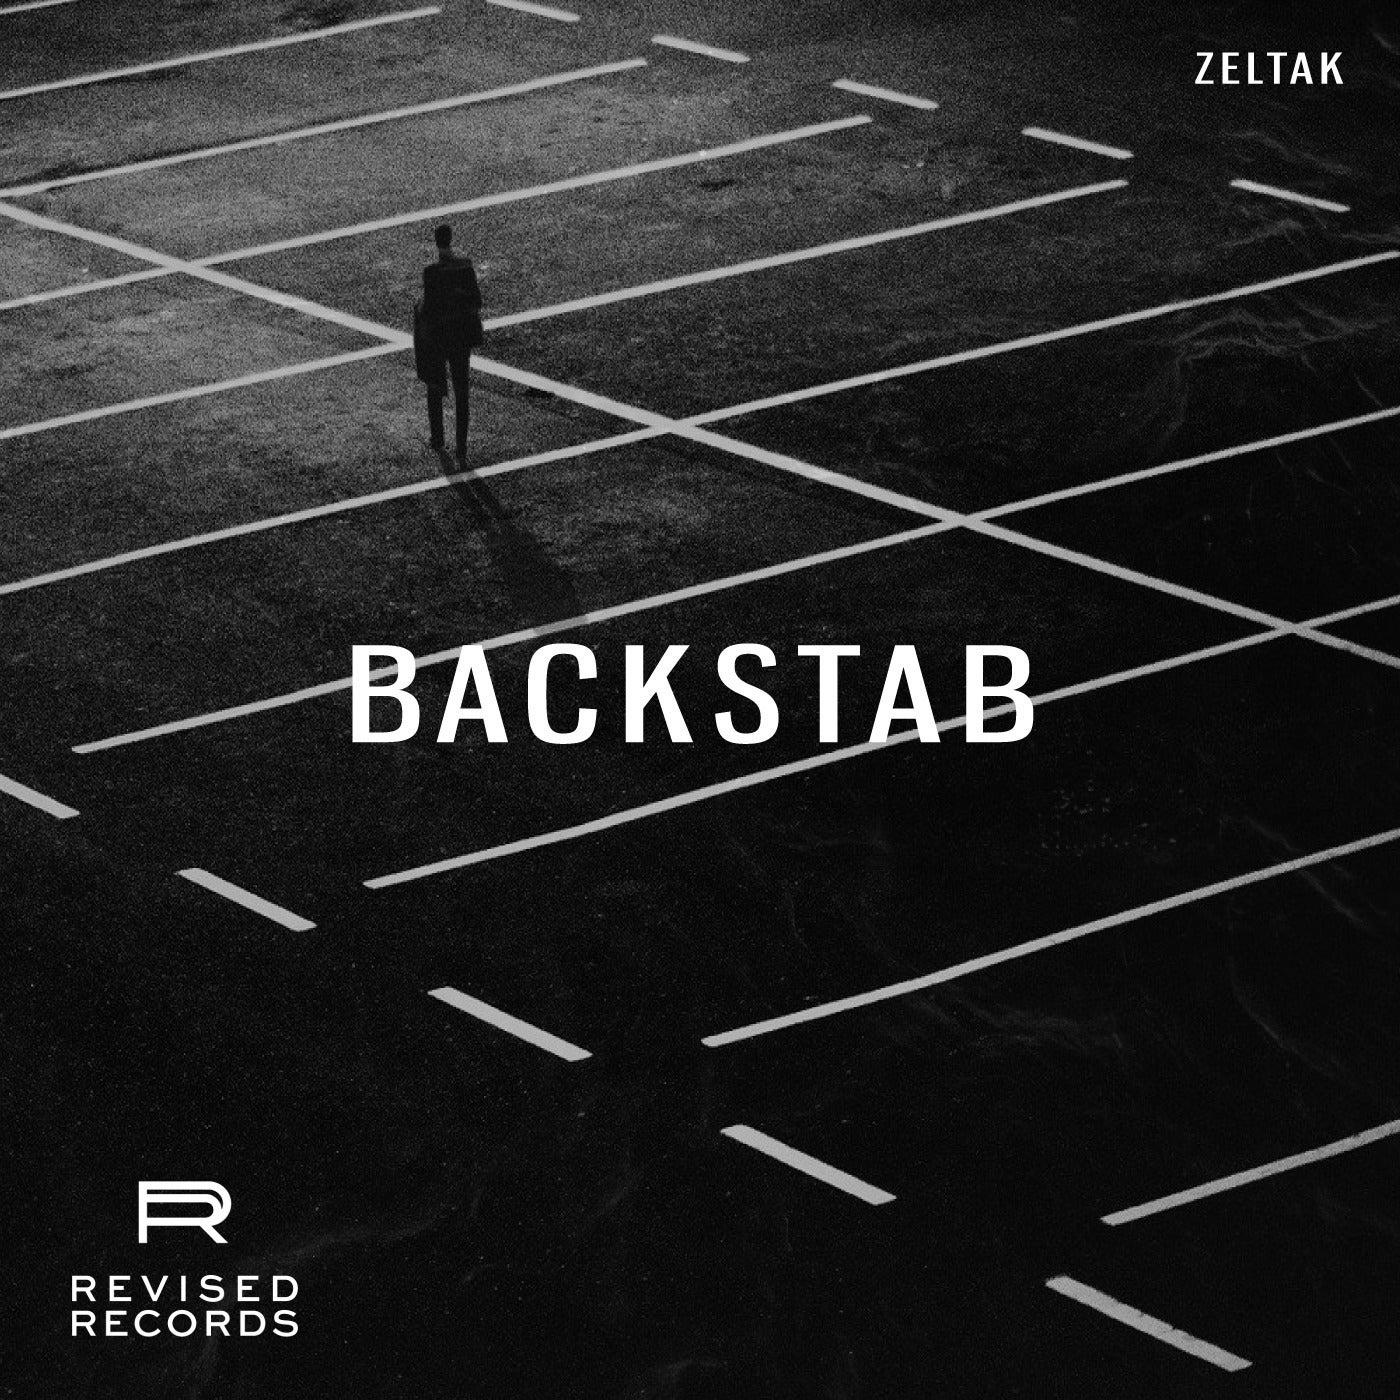 Backstab (Original Mix)